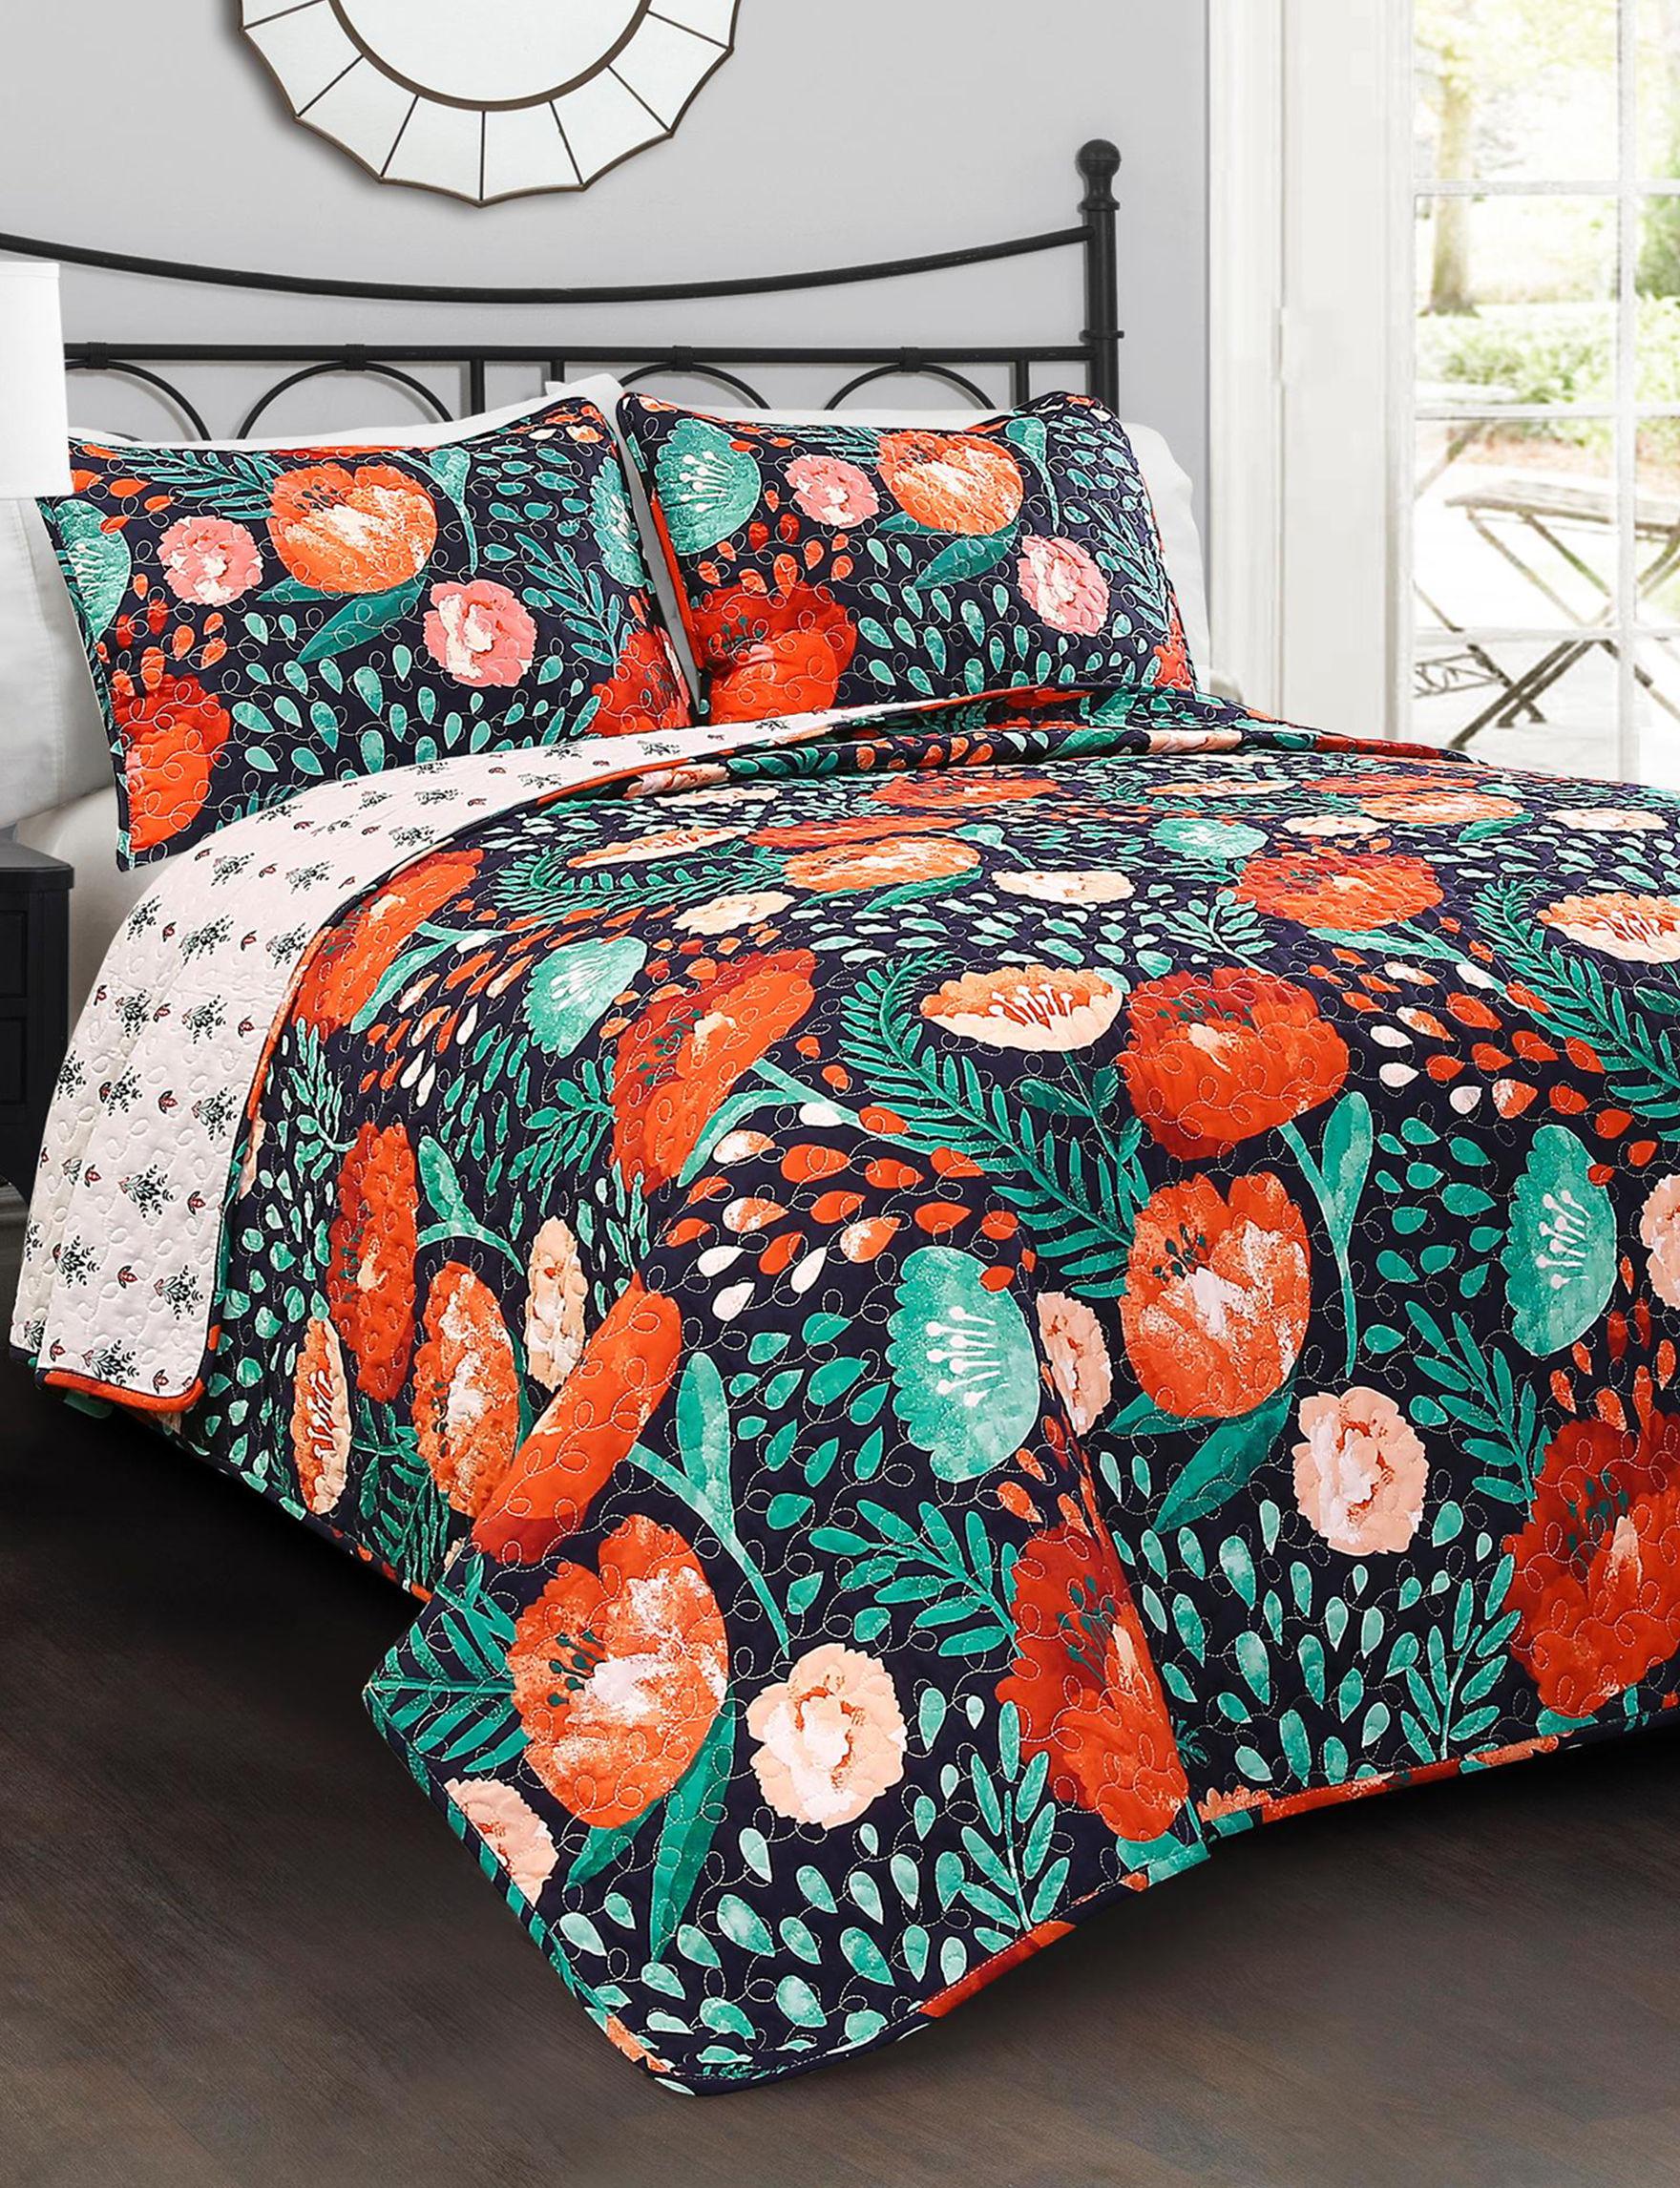 Lush Decor Navy Multi Quilts & Quilt Sets